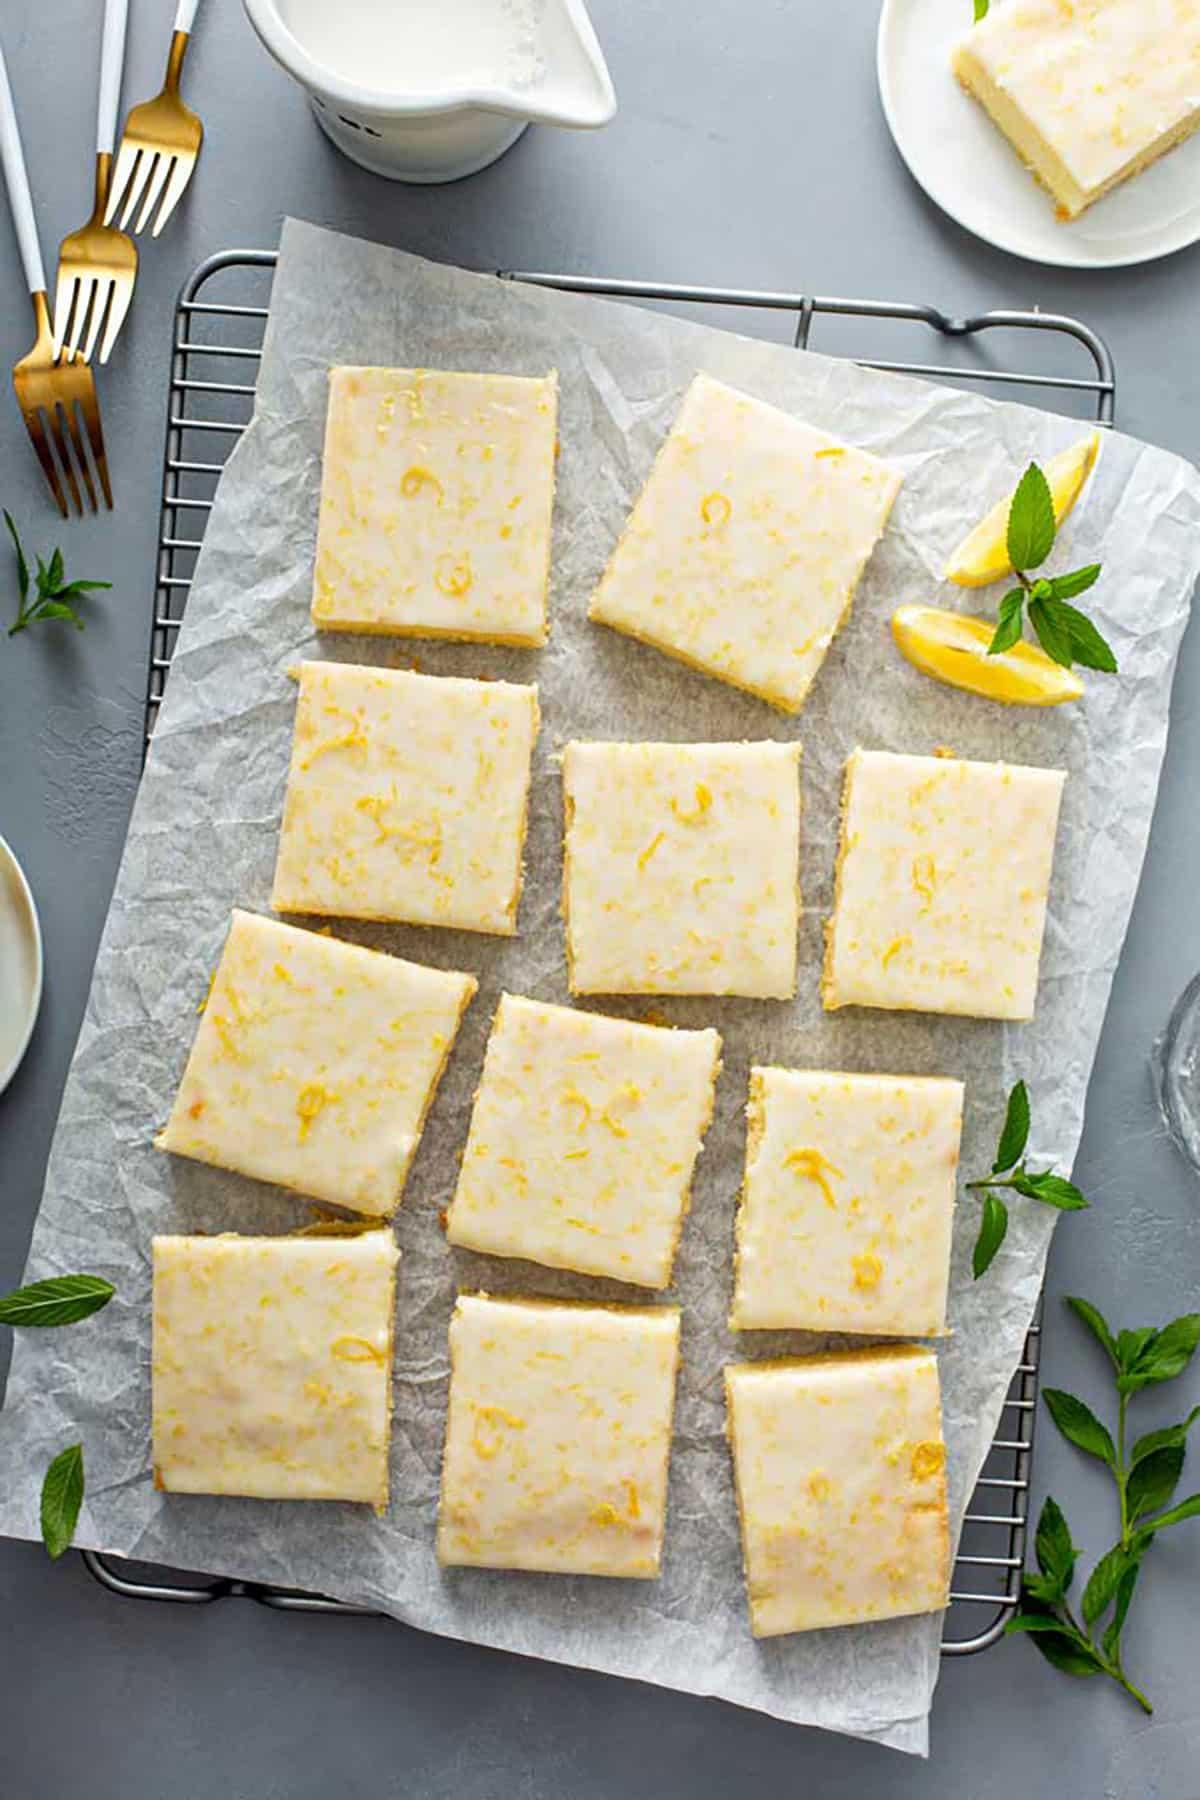 Cut up glazed lemon brownies on a cooling rack